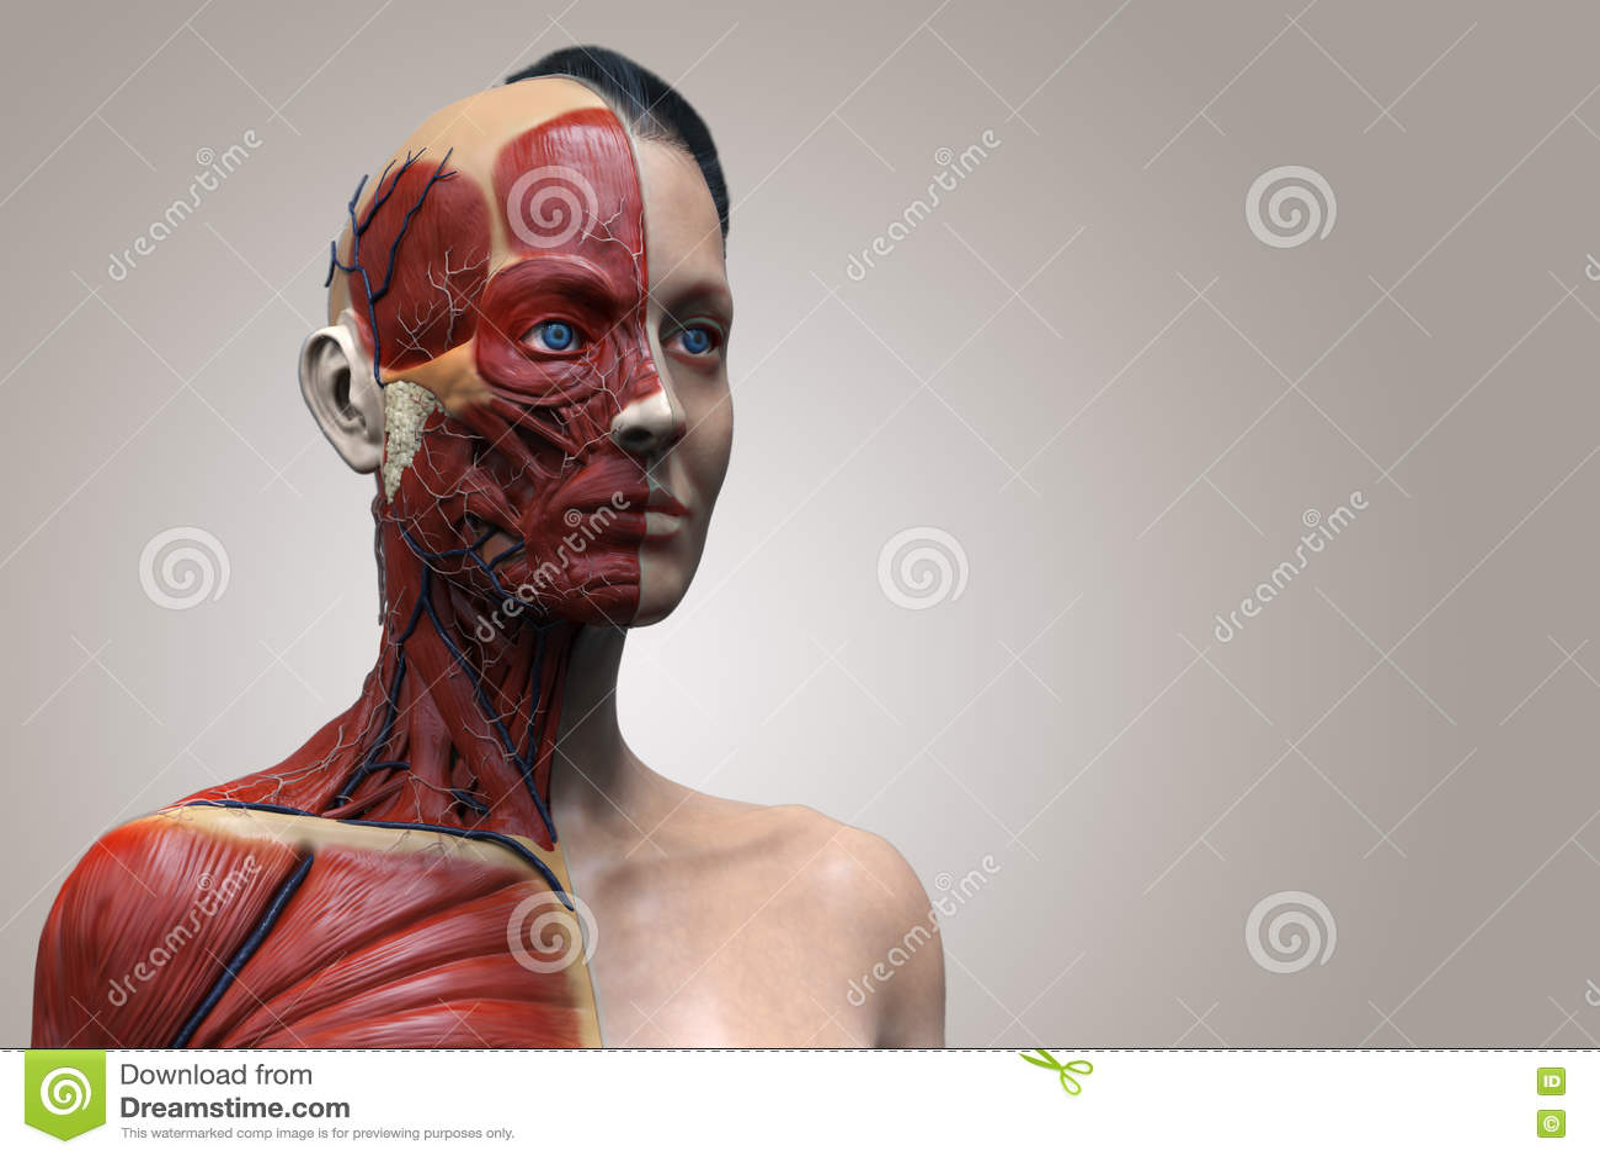 Human Body Anatomy Of Woman Stock Illustration Illustration Of